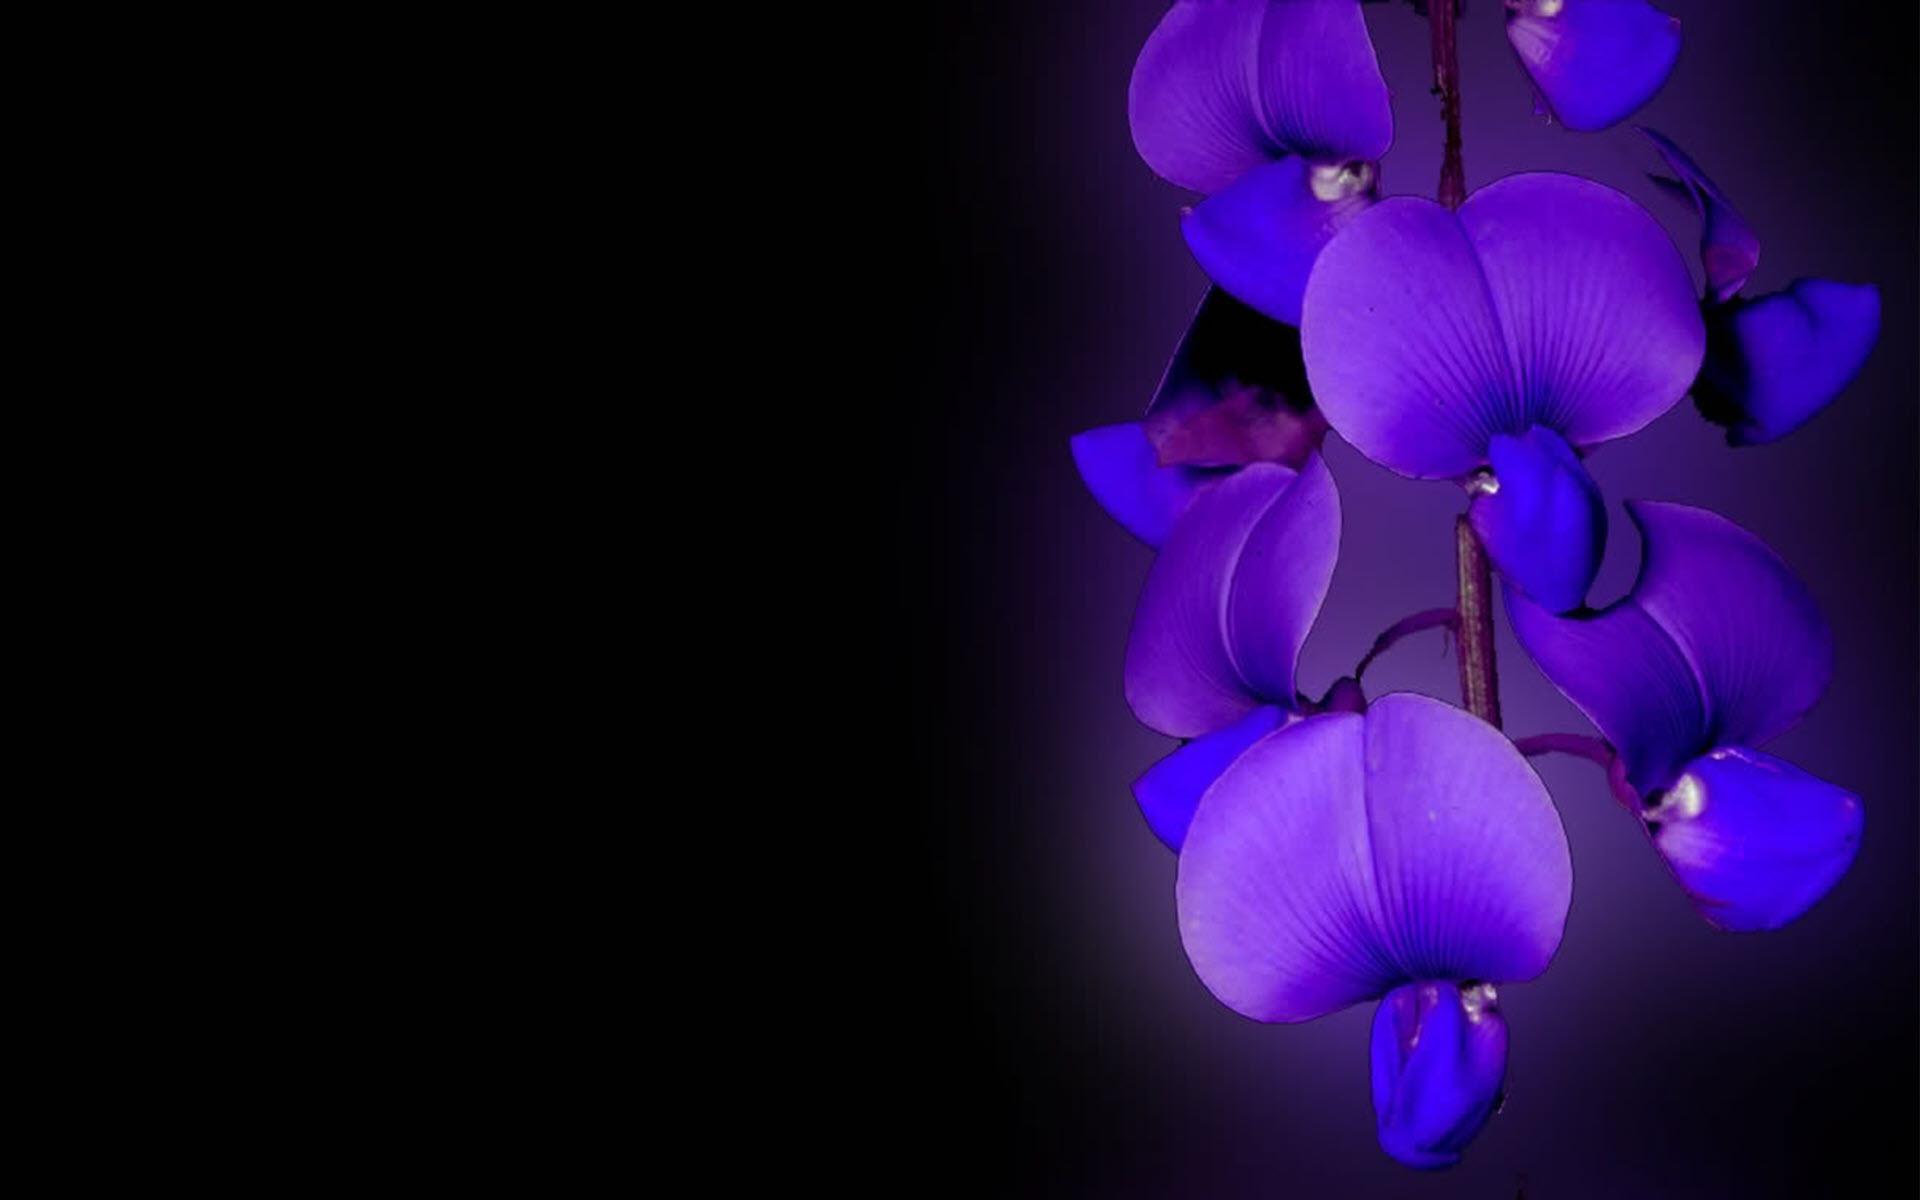 Hình nền hoa lan cực đẹp